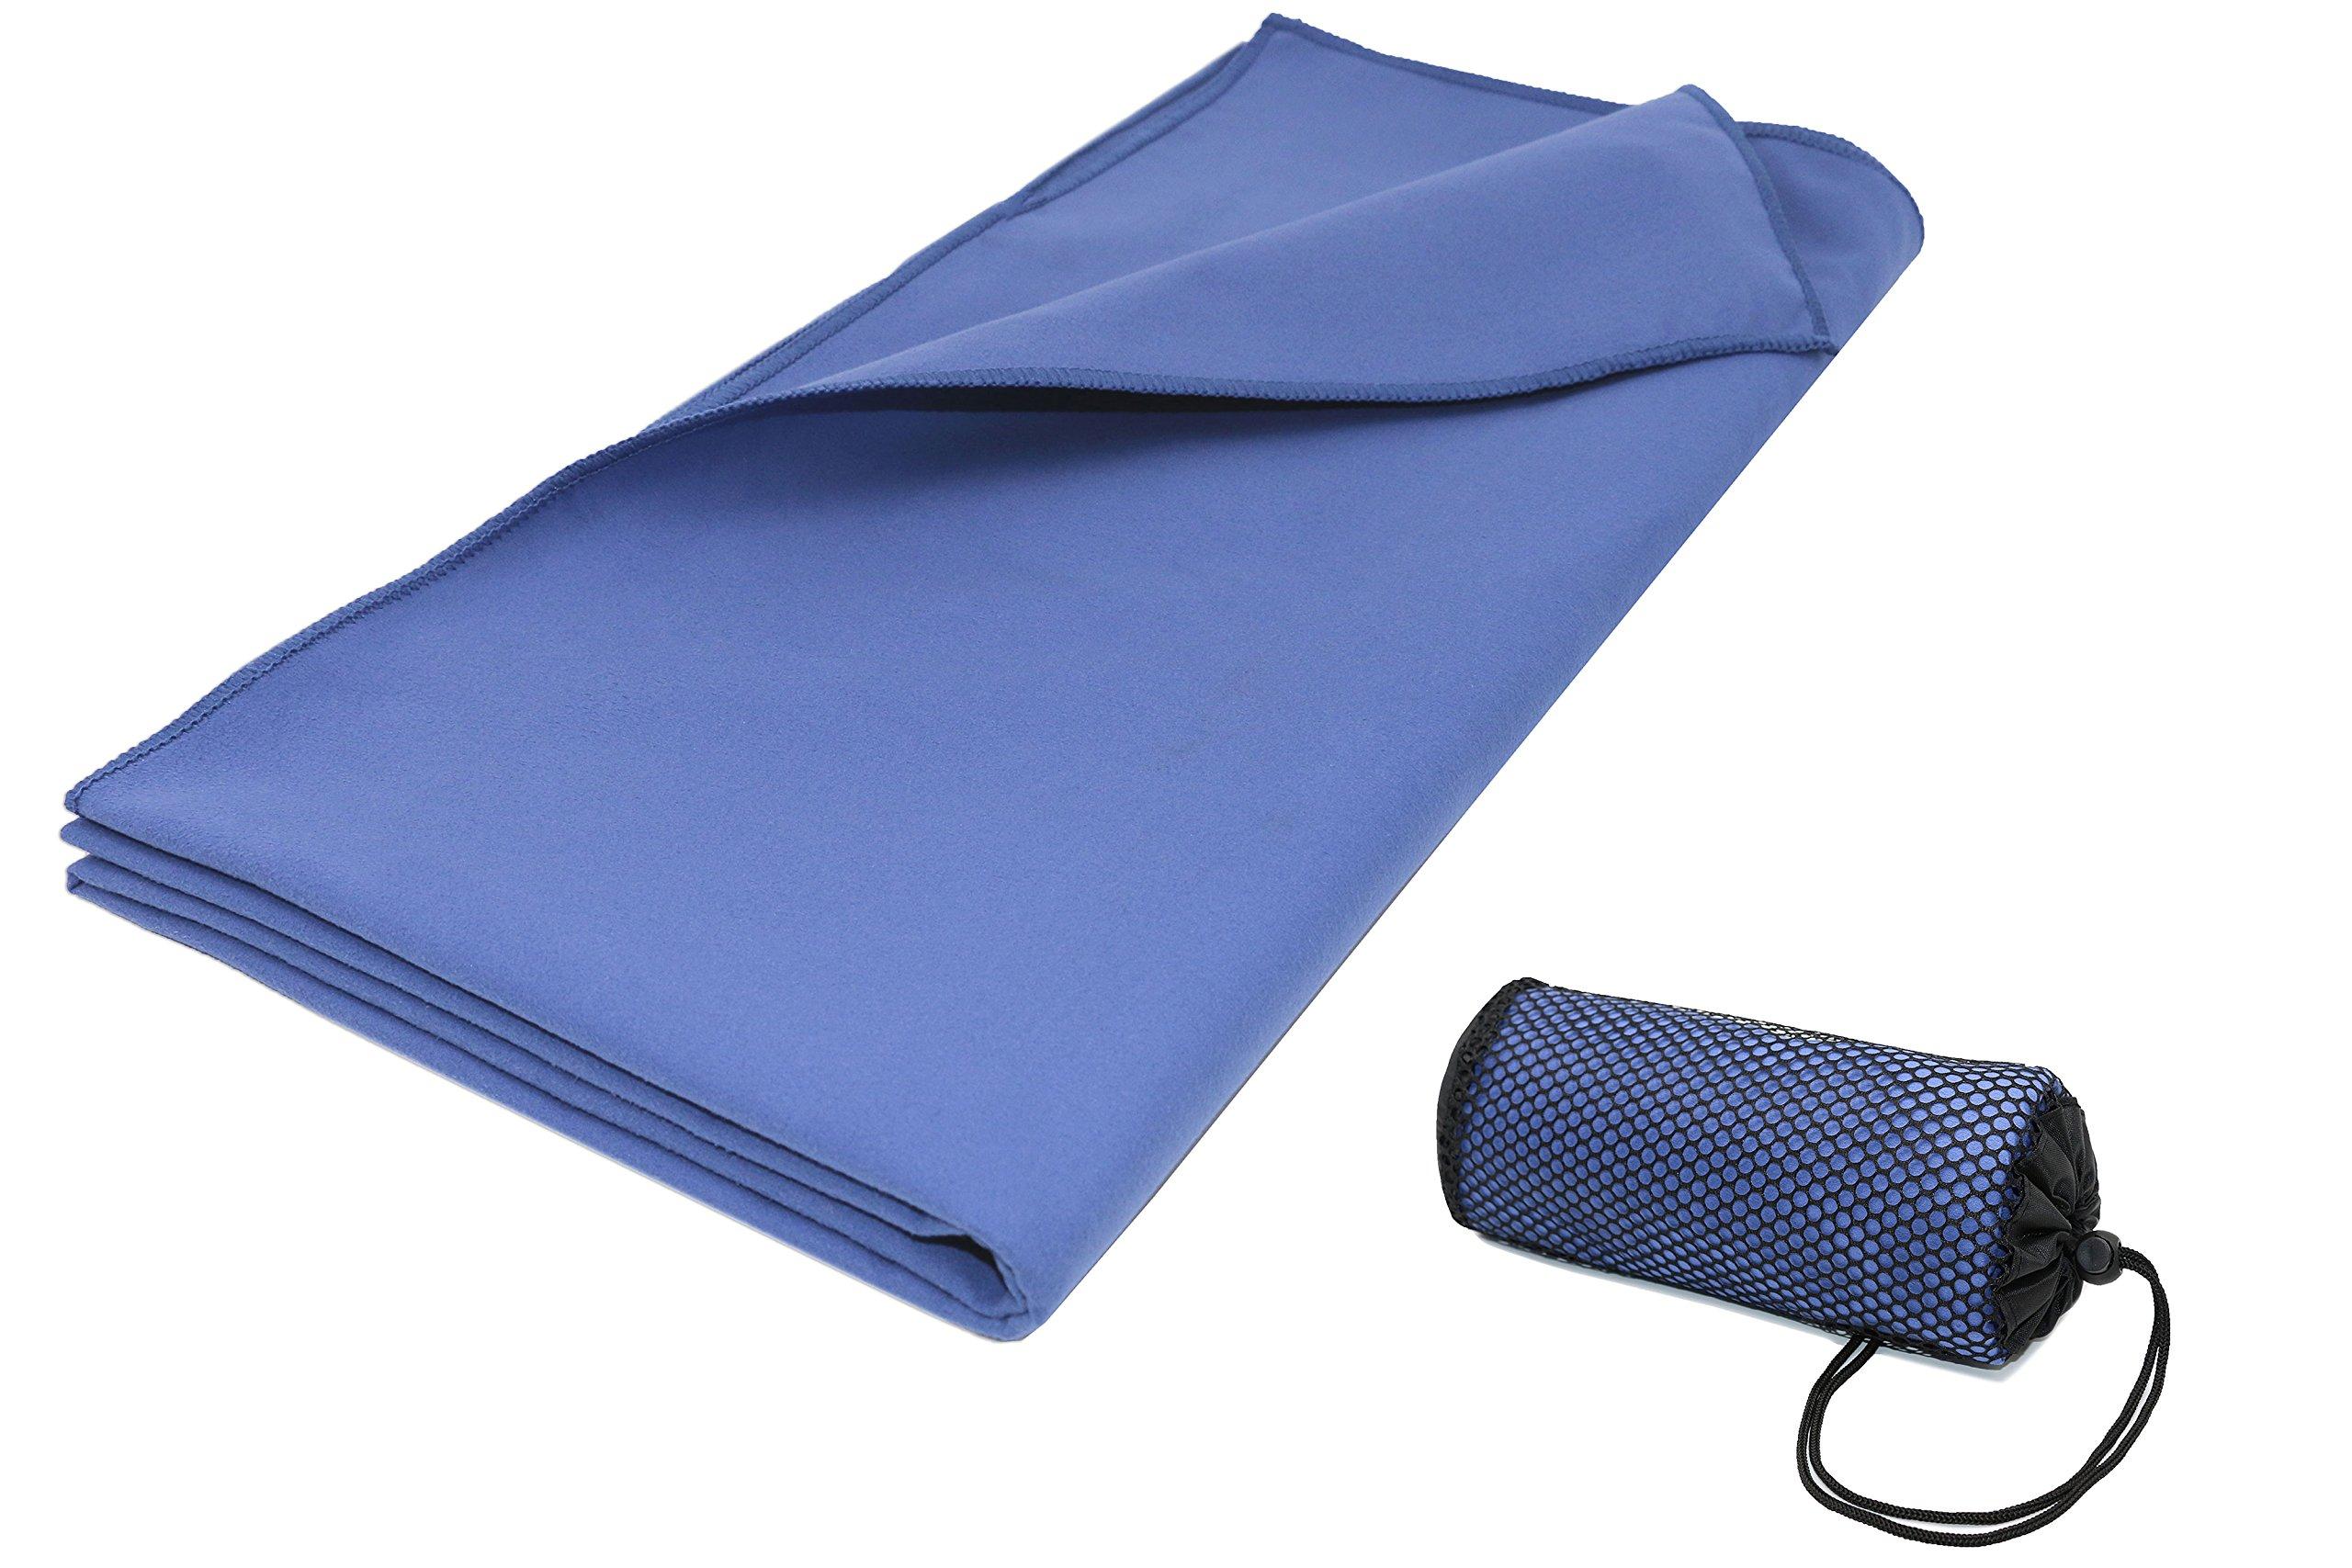 ZOLLNER Toalla de Microfibra Grande 90x180 cm, Azul Marino product image